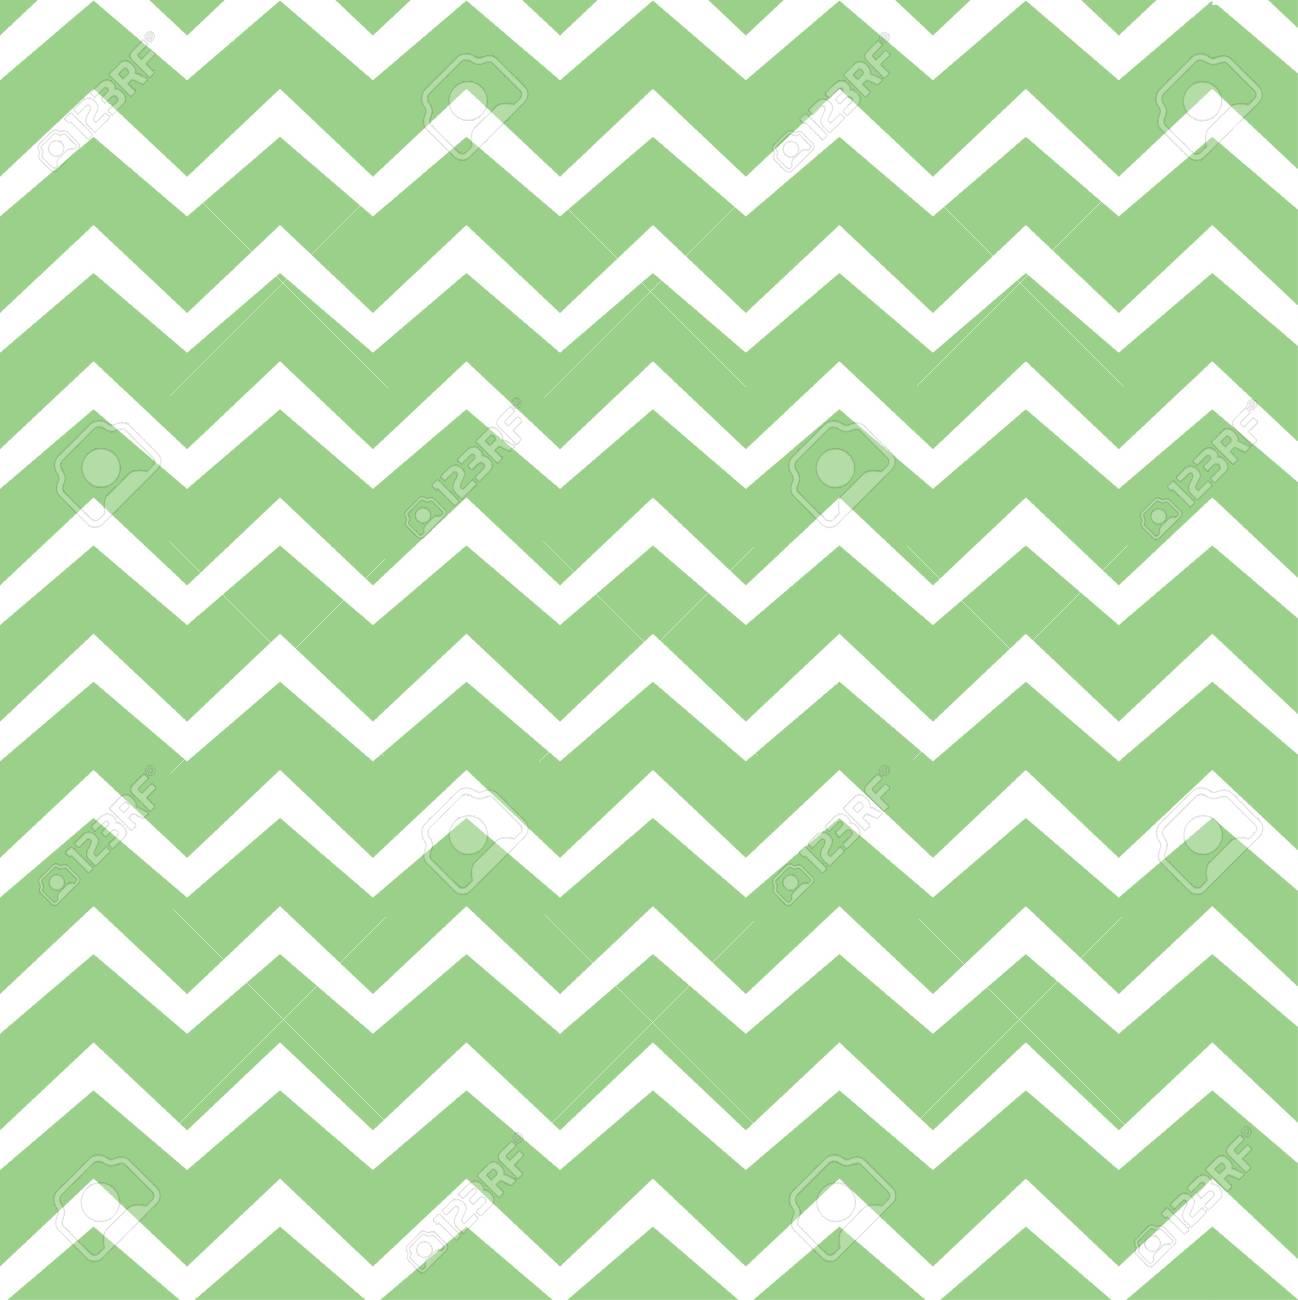 Seamless zigzag line pattern - 114708570